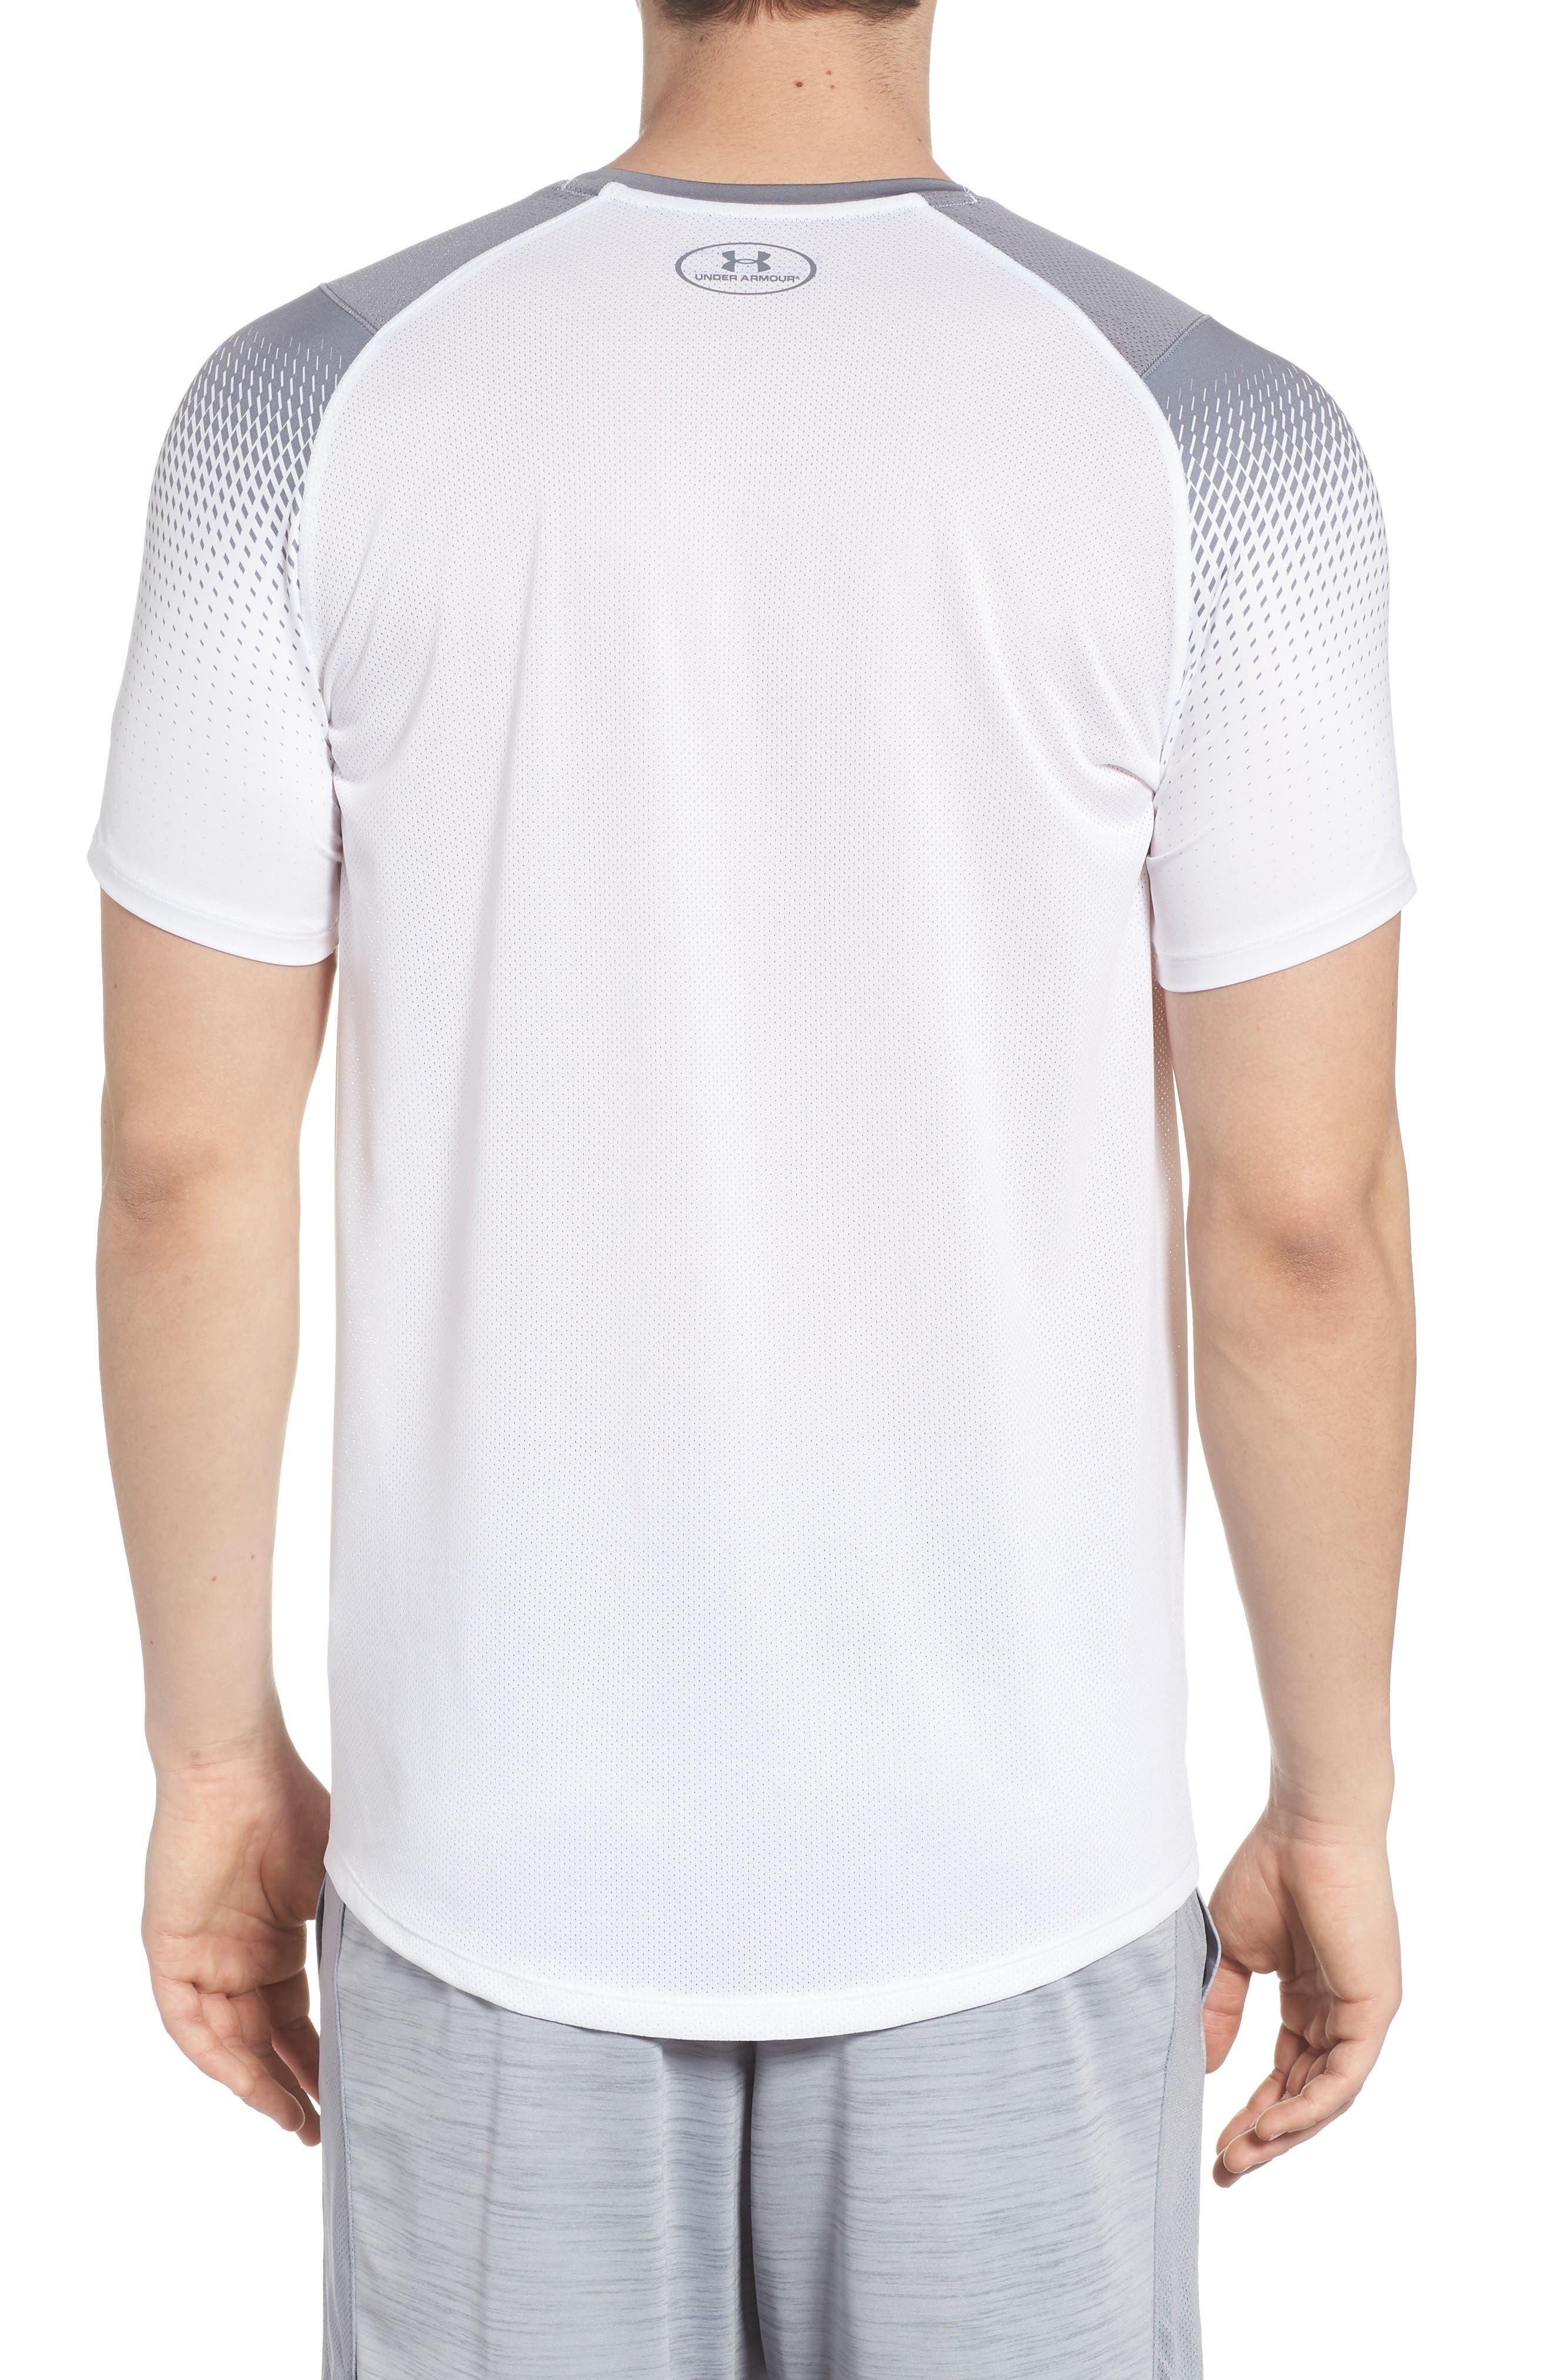 MK1 Dash Print Crewneck T-Shirt,                             Alternate thumbnail 2, color,                             WHITE / ZINC GREH / GRAPHITE